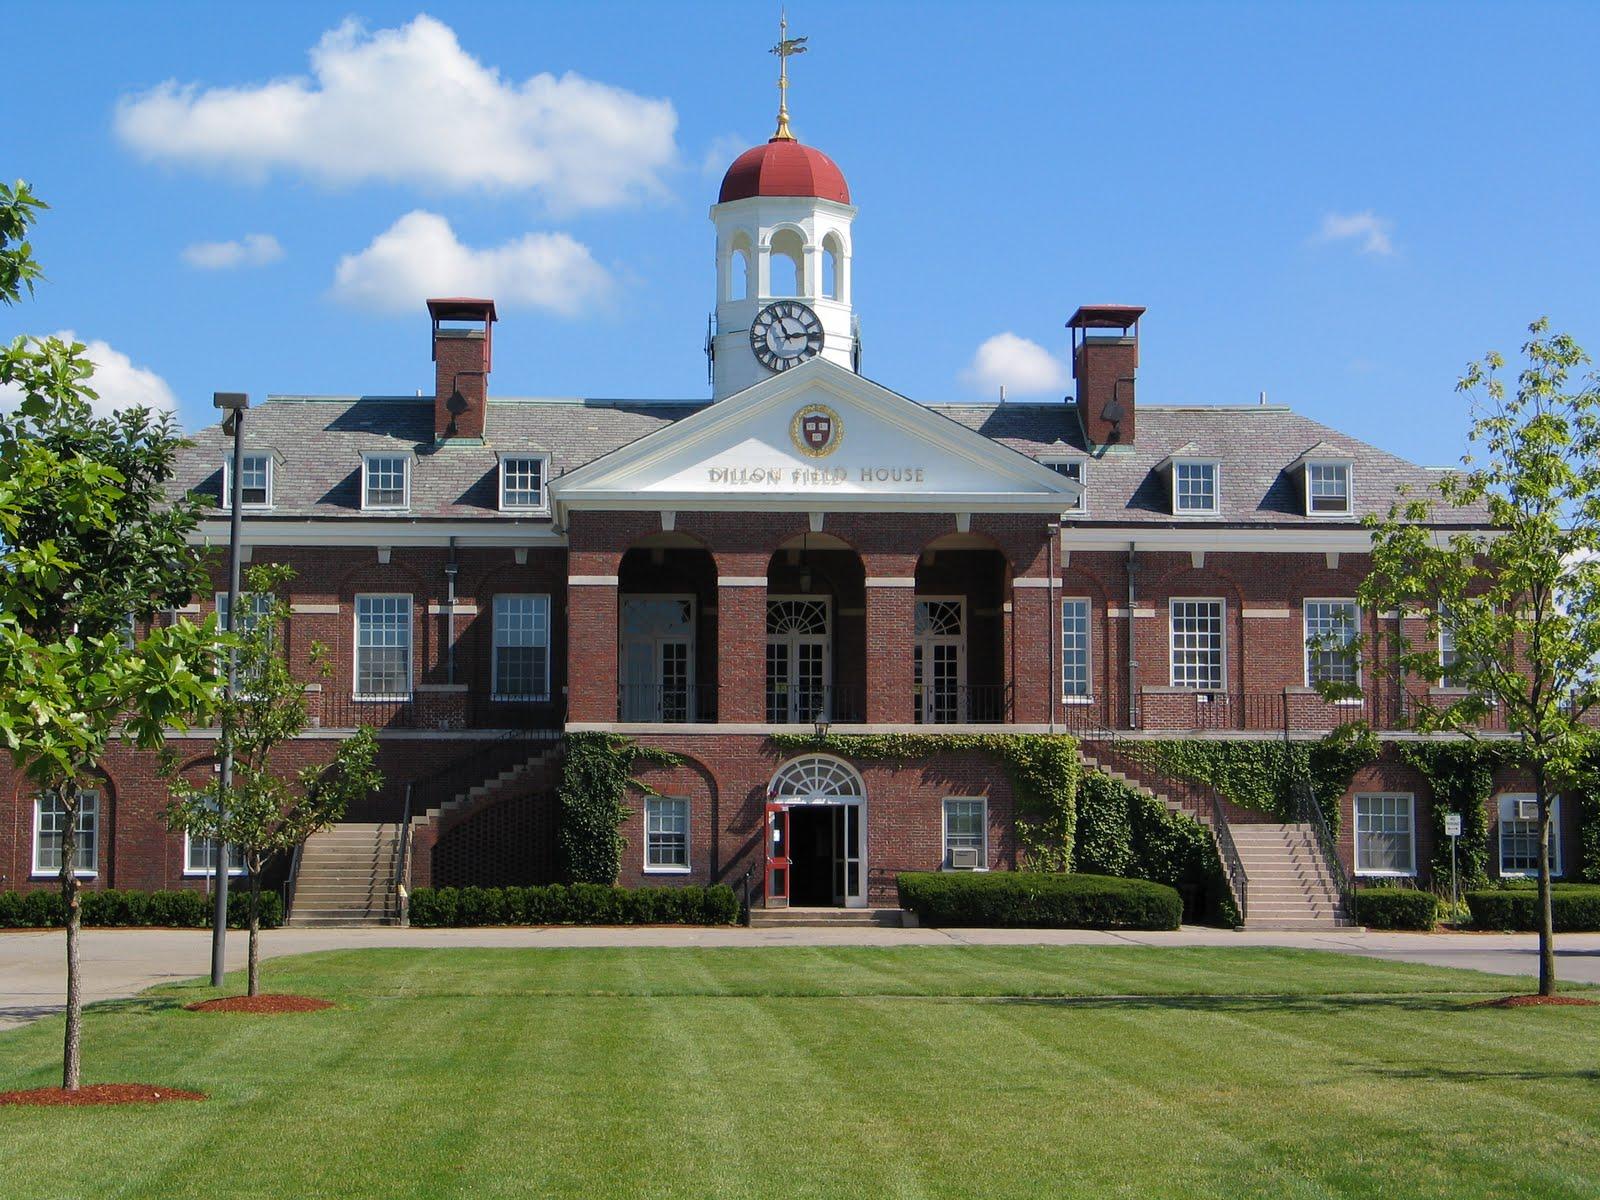 Harvard University #301598 | Full HD Widescreen wallpapers for